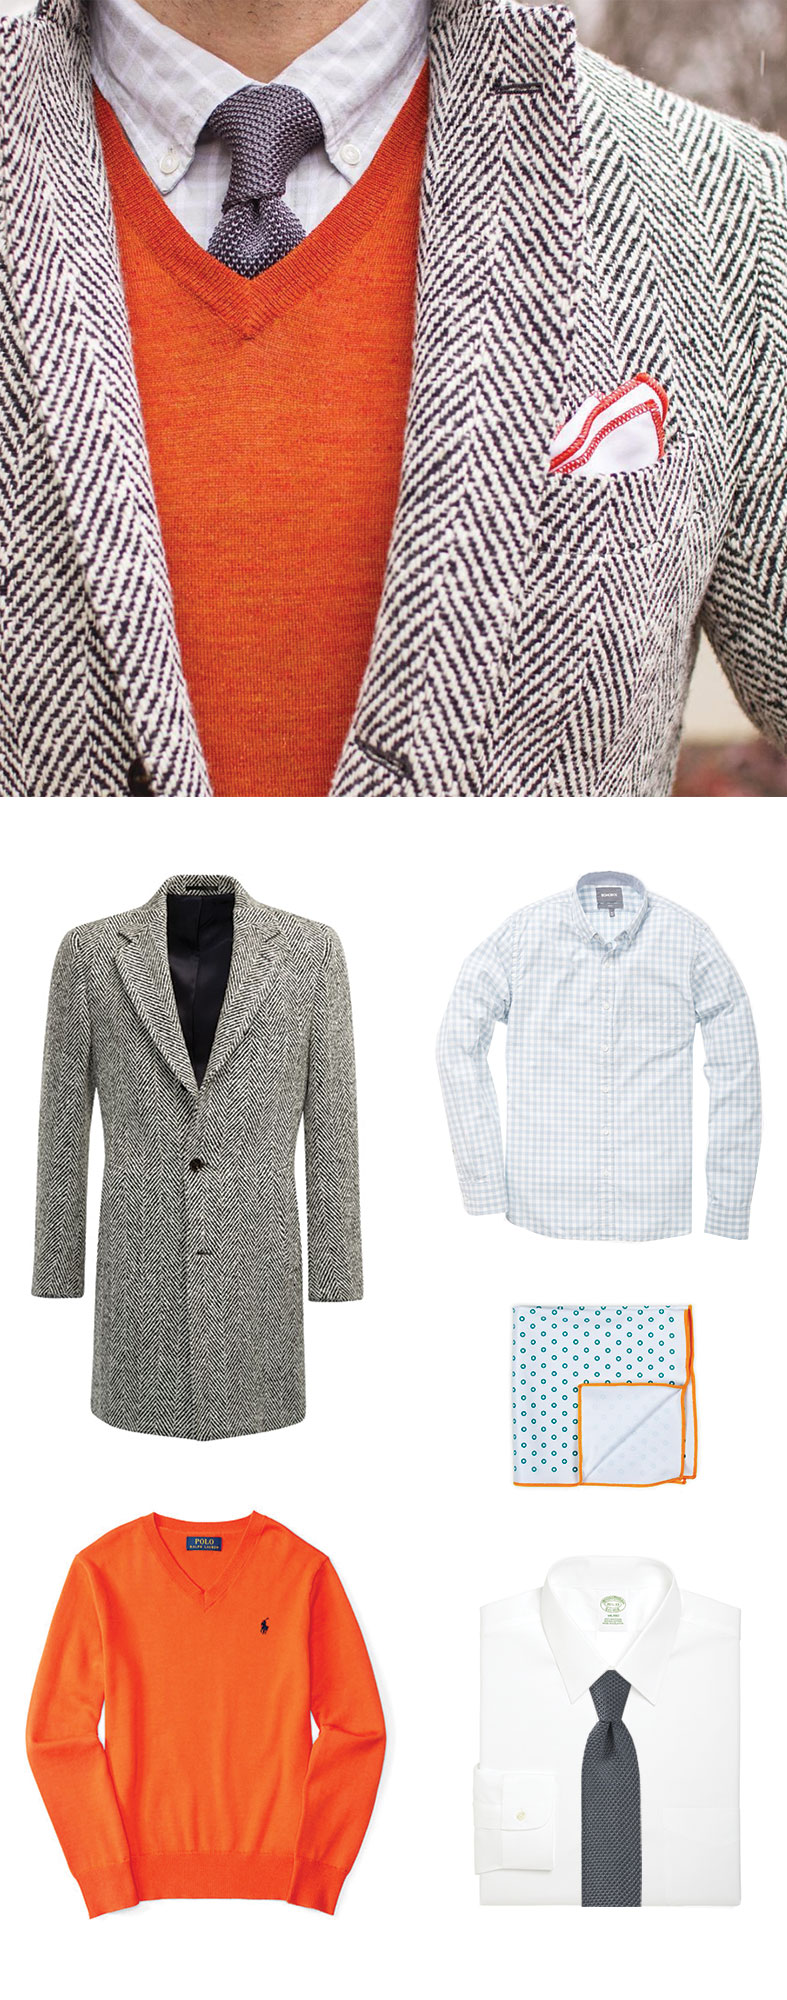 Knit Tie and Orange Sweater